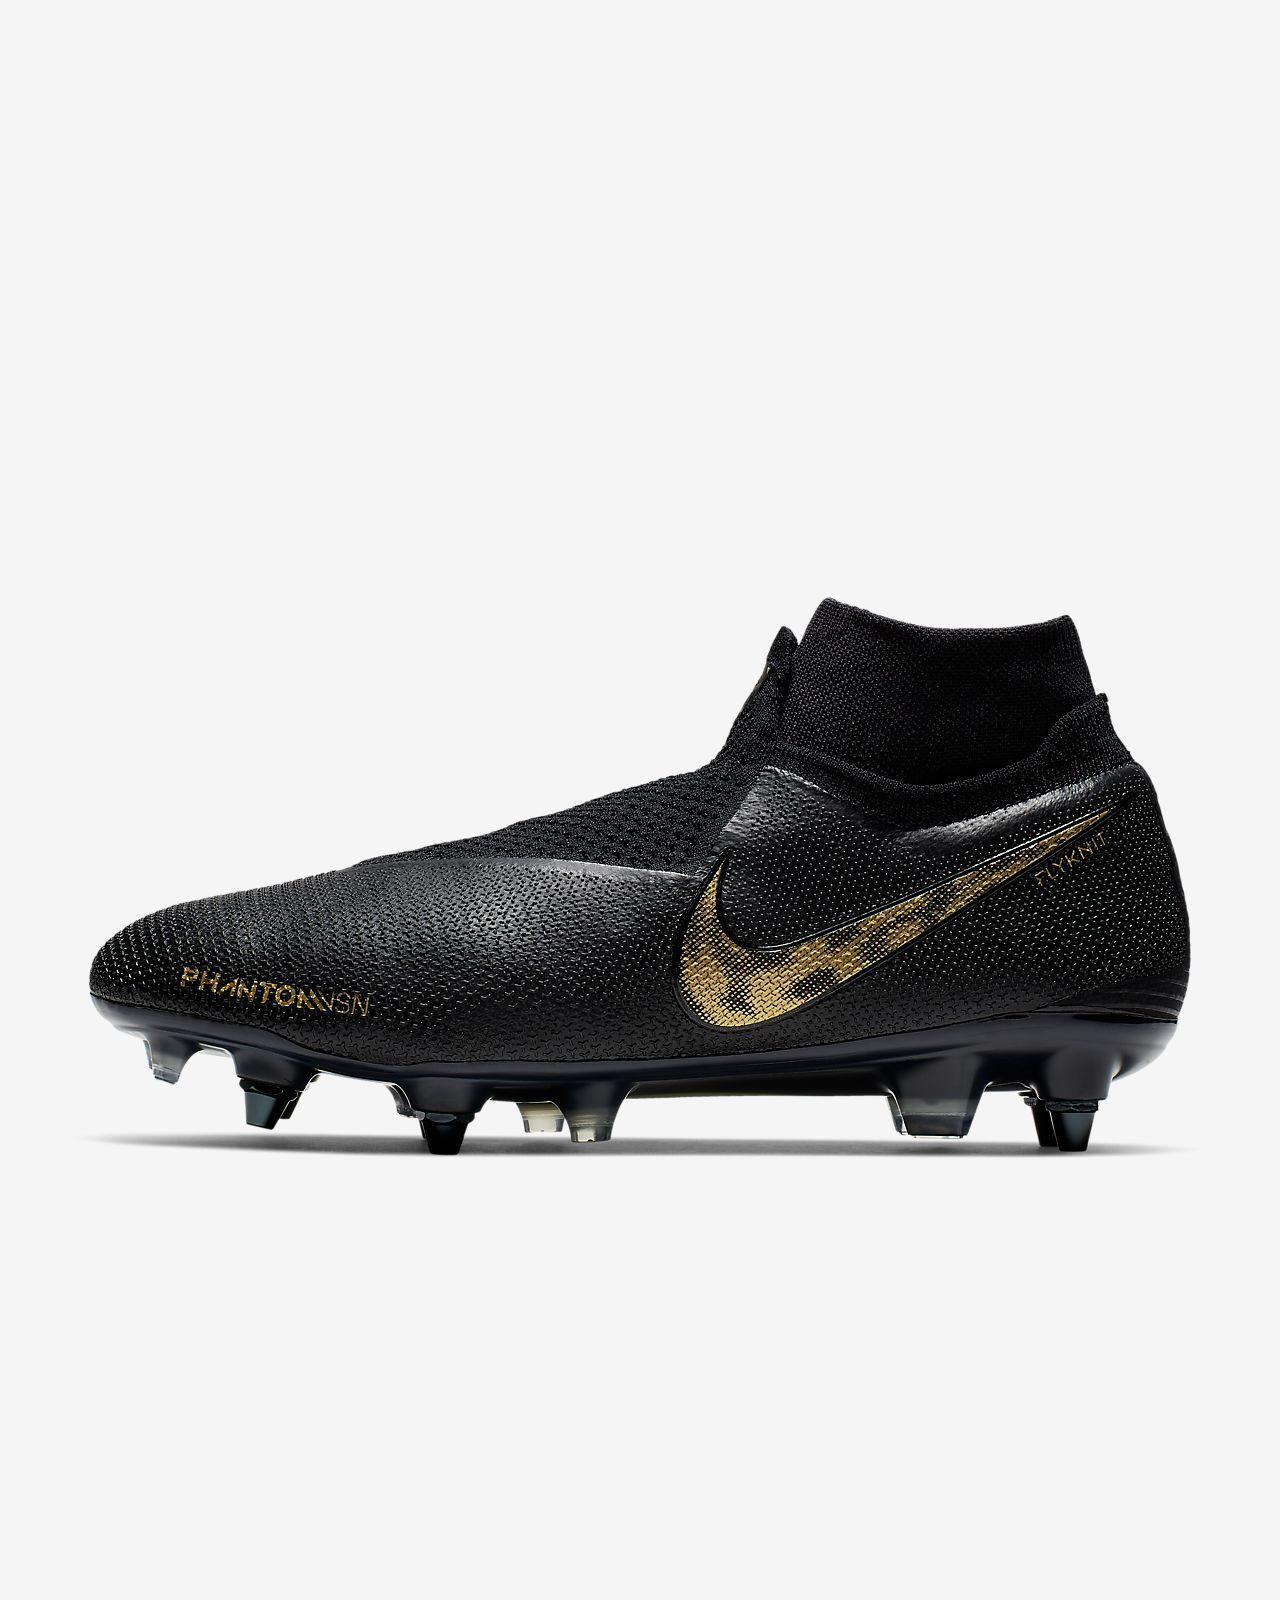 Nike Phantom Vision Elite Dynamic Fit Angi-Clog SG-PRO stoplis futballcipő